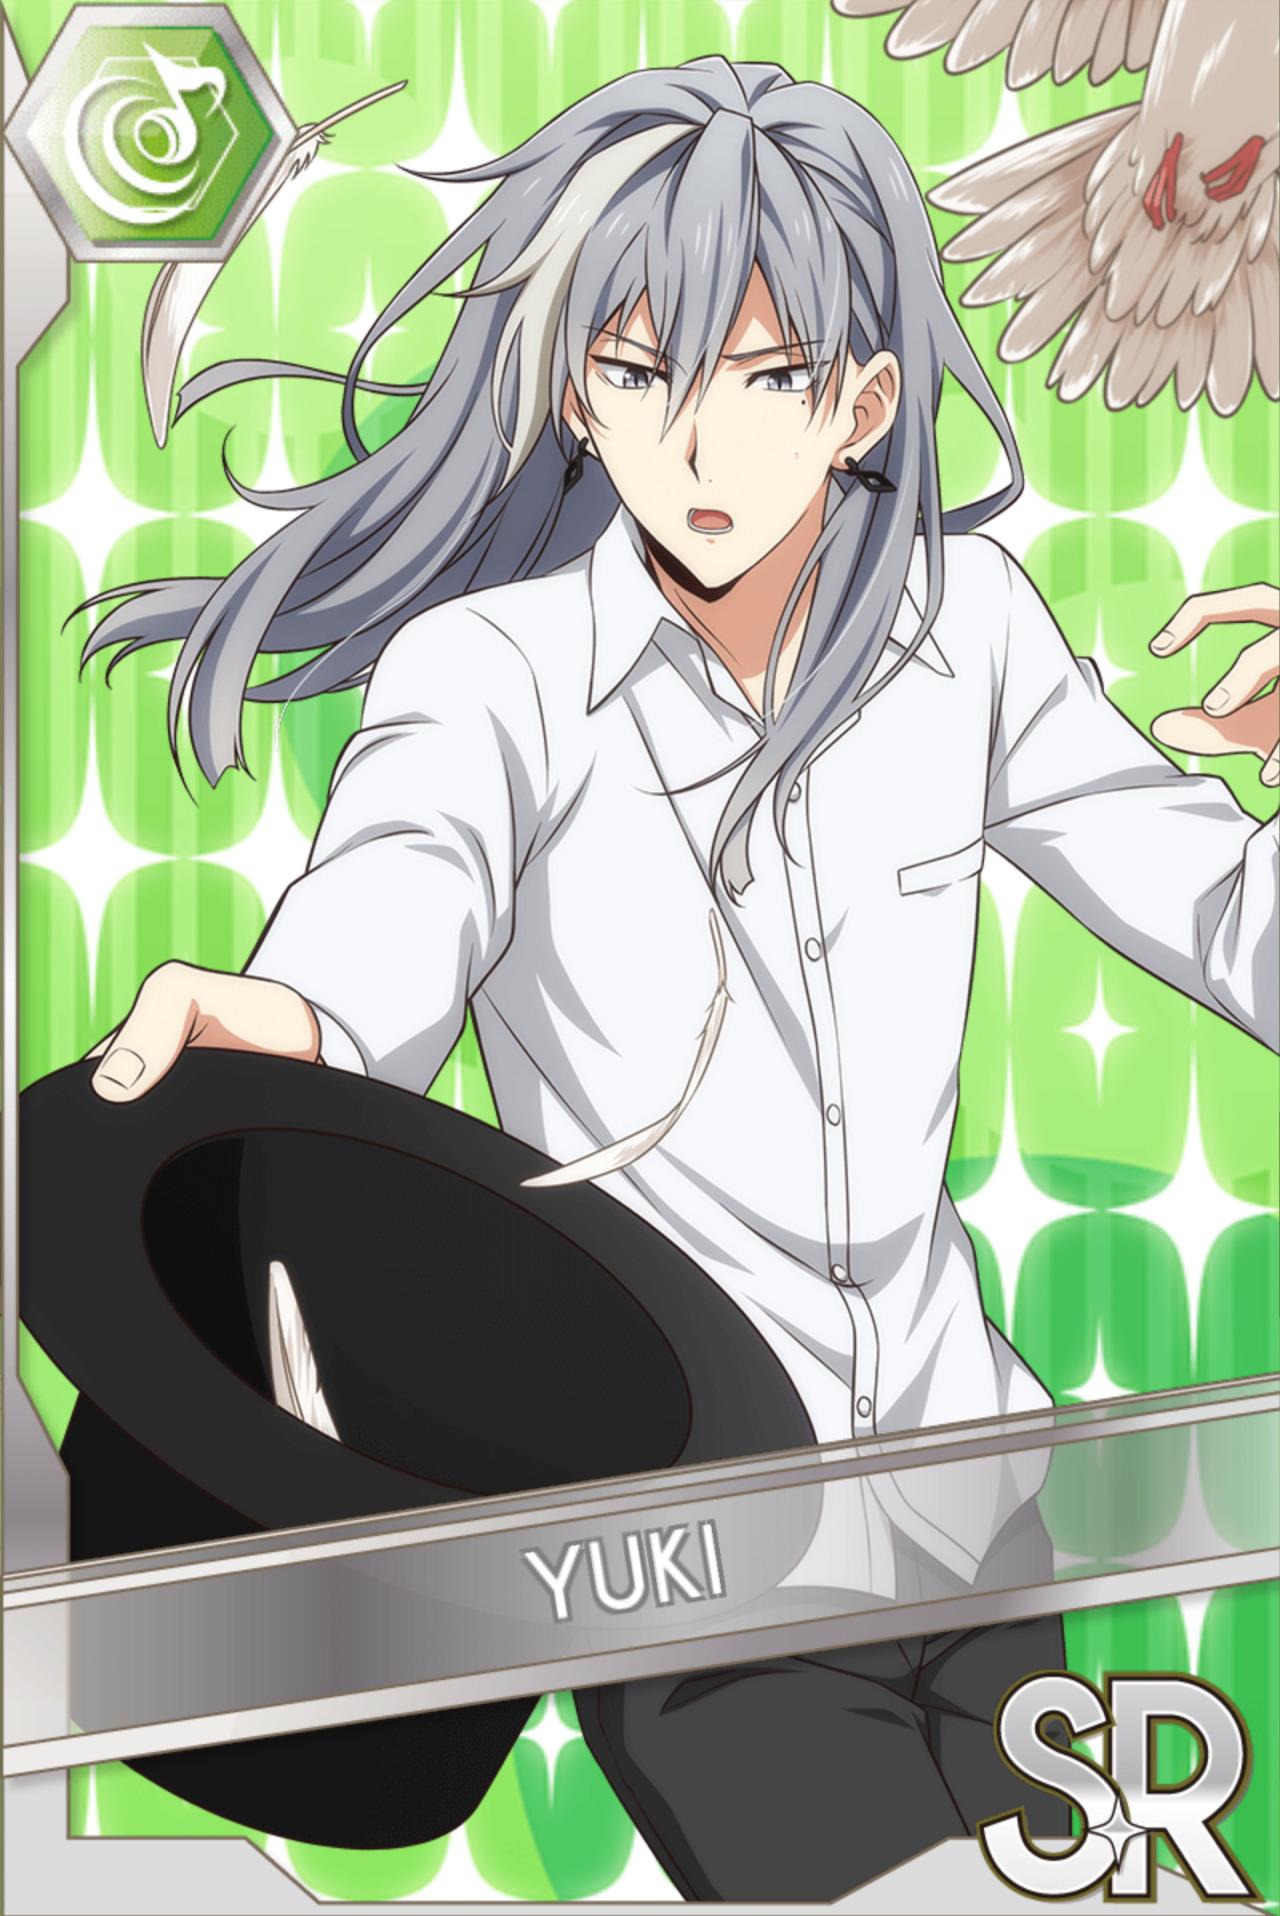 Yuki (Work)